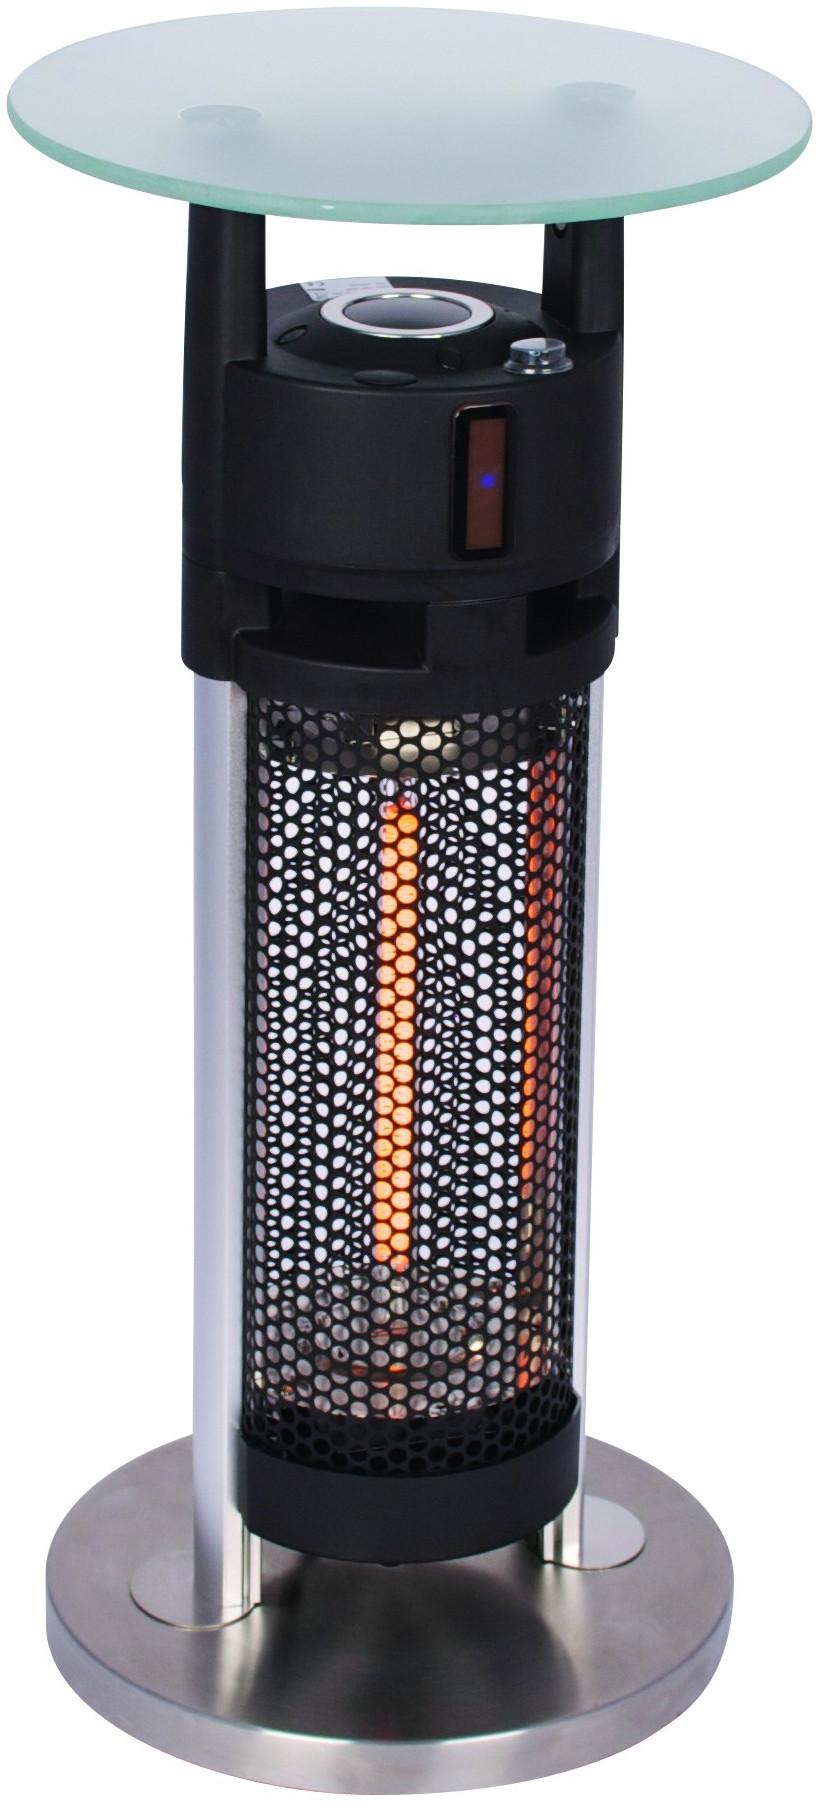 Allibert Badkamer Blokker ~ Badkamer Verwarming Elektrisch Gamma Drl tekno recht badkamer design